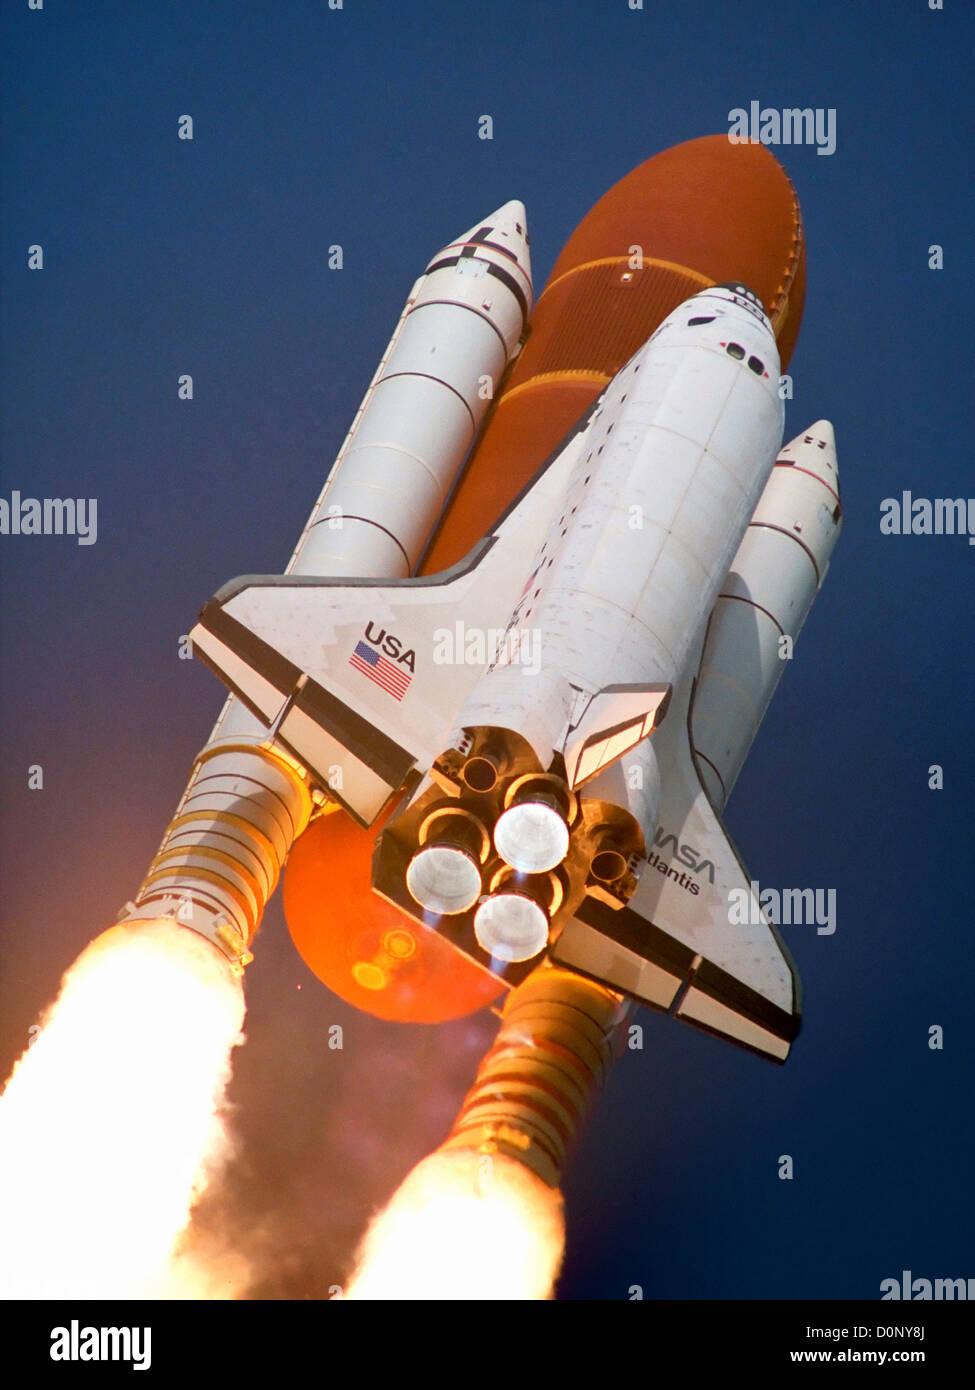 space shuttle namen - photo #47